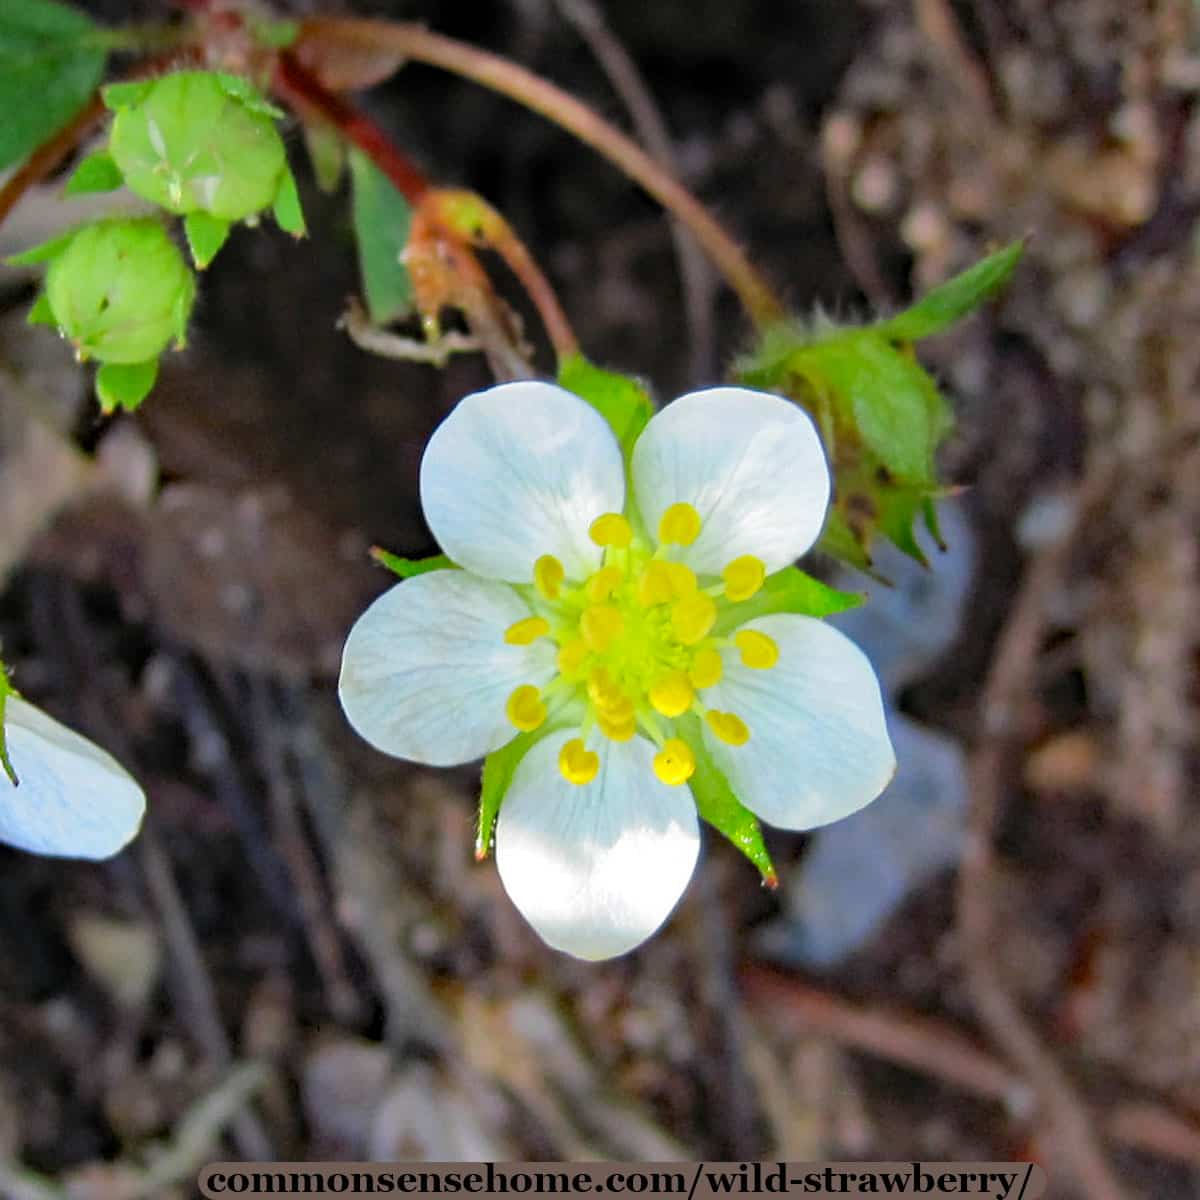 wild strawberry white flower blossom